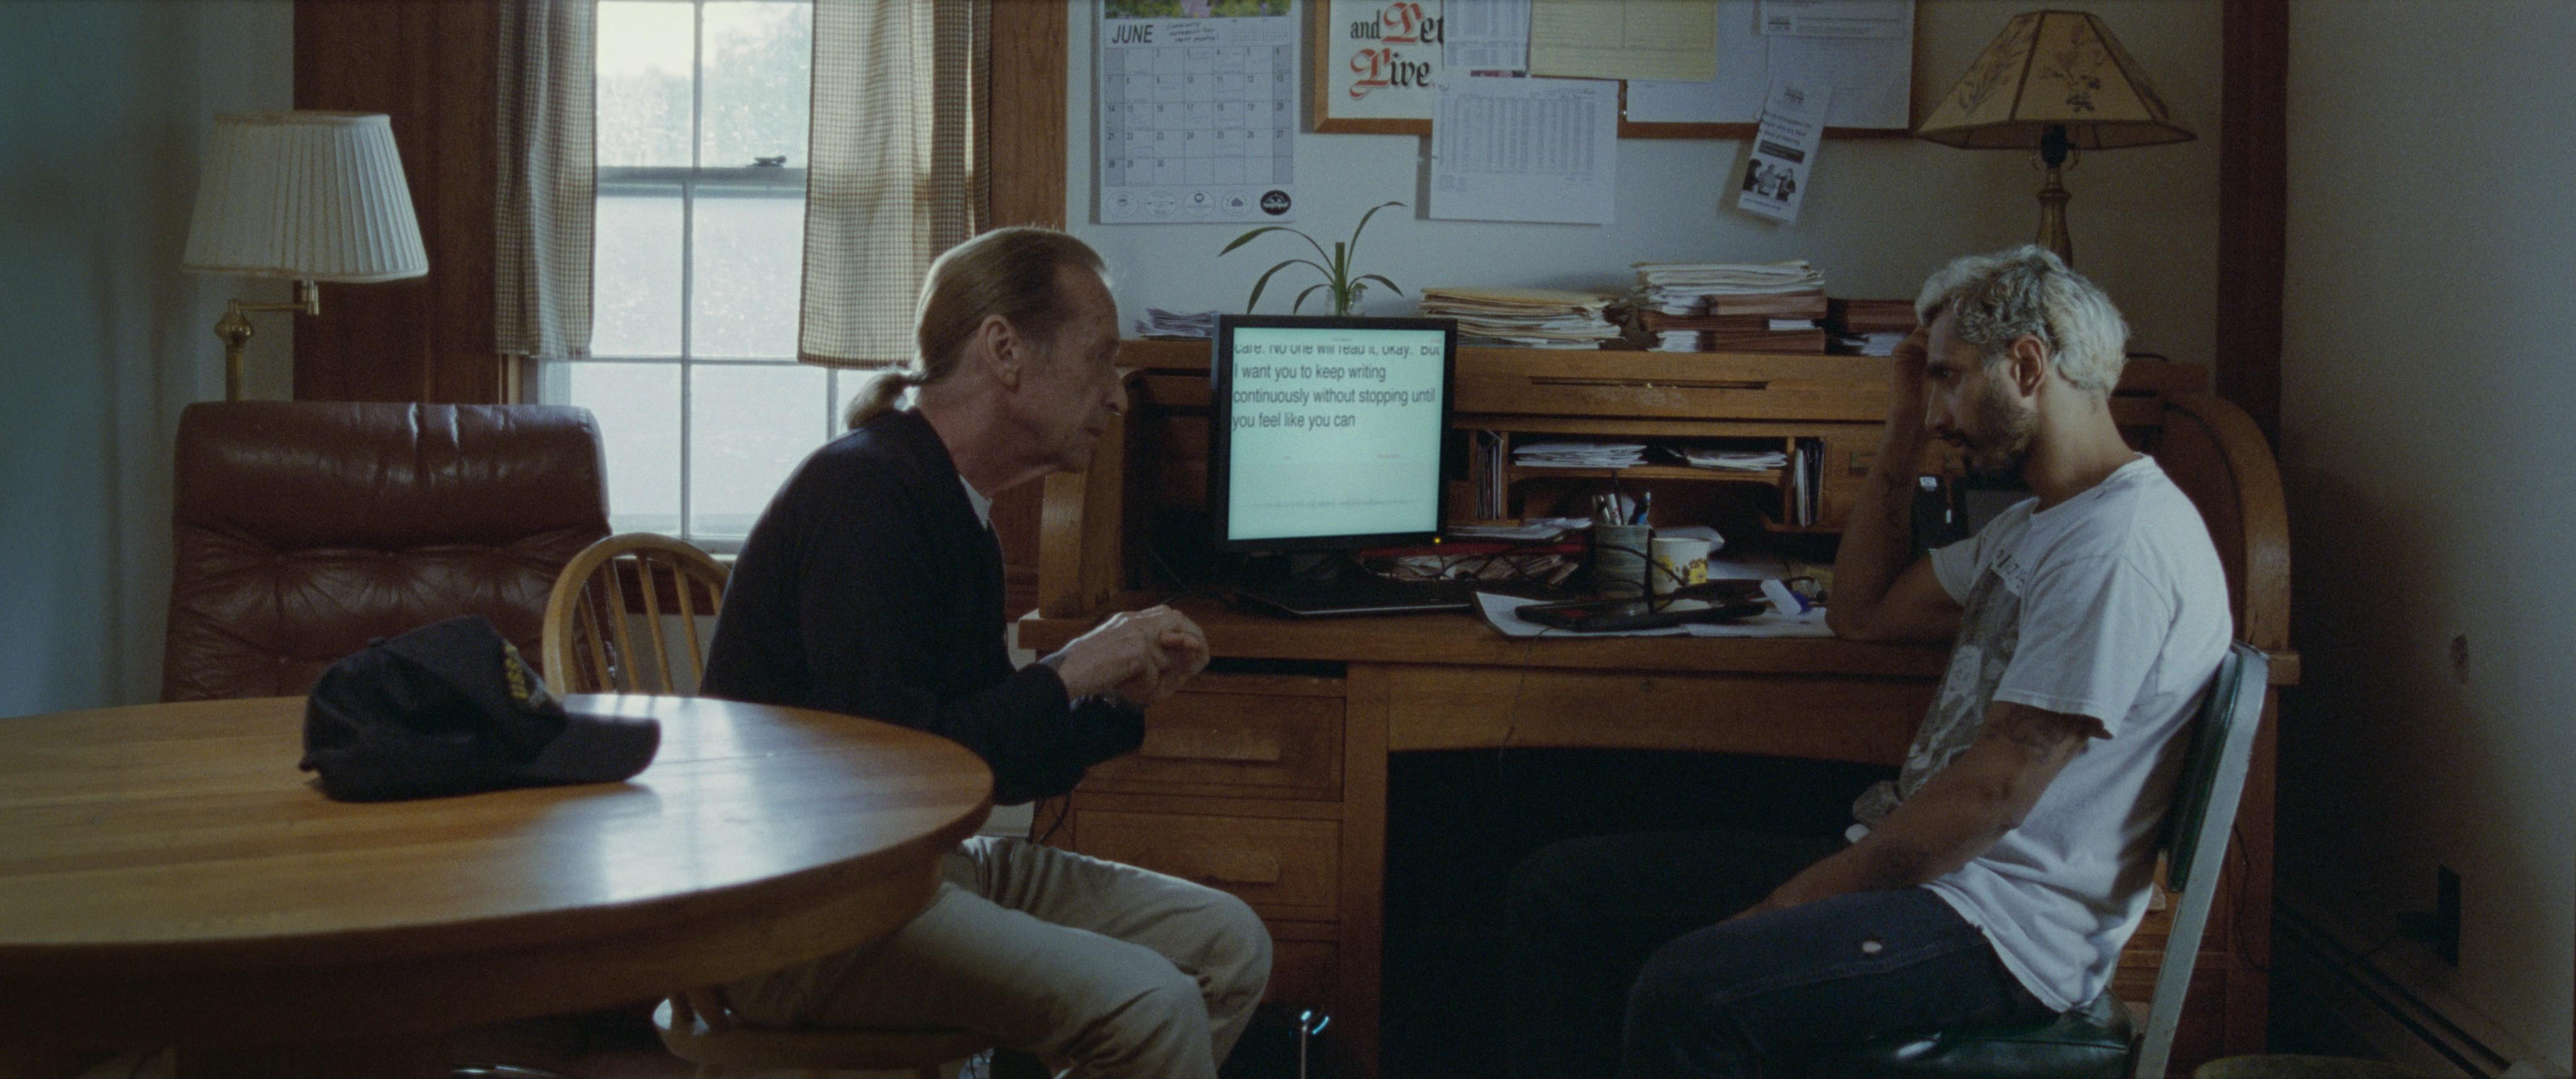 Indicado ao Oscar, 'O som do silêncio' dá destaque raro à cultura dos surdos